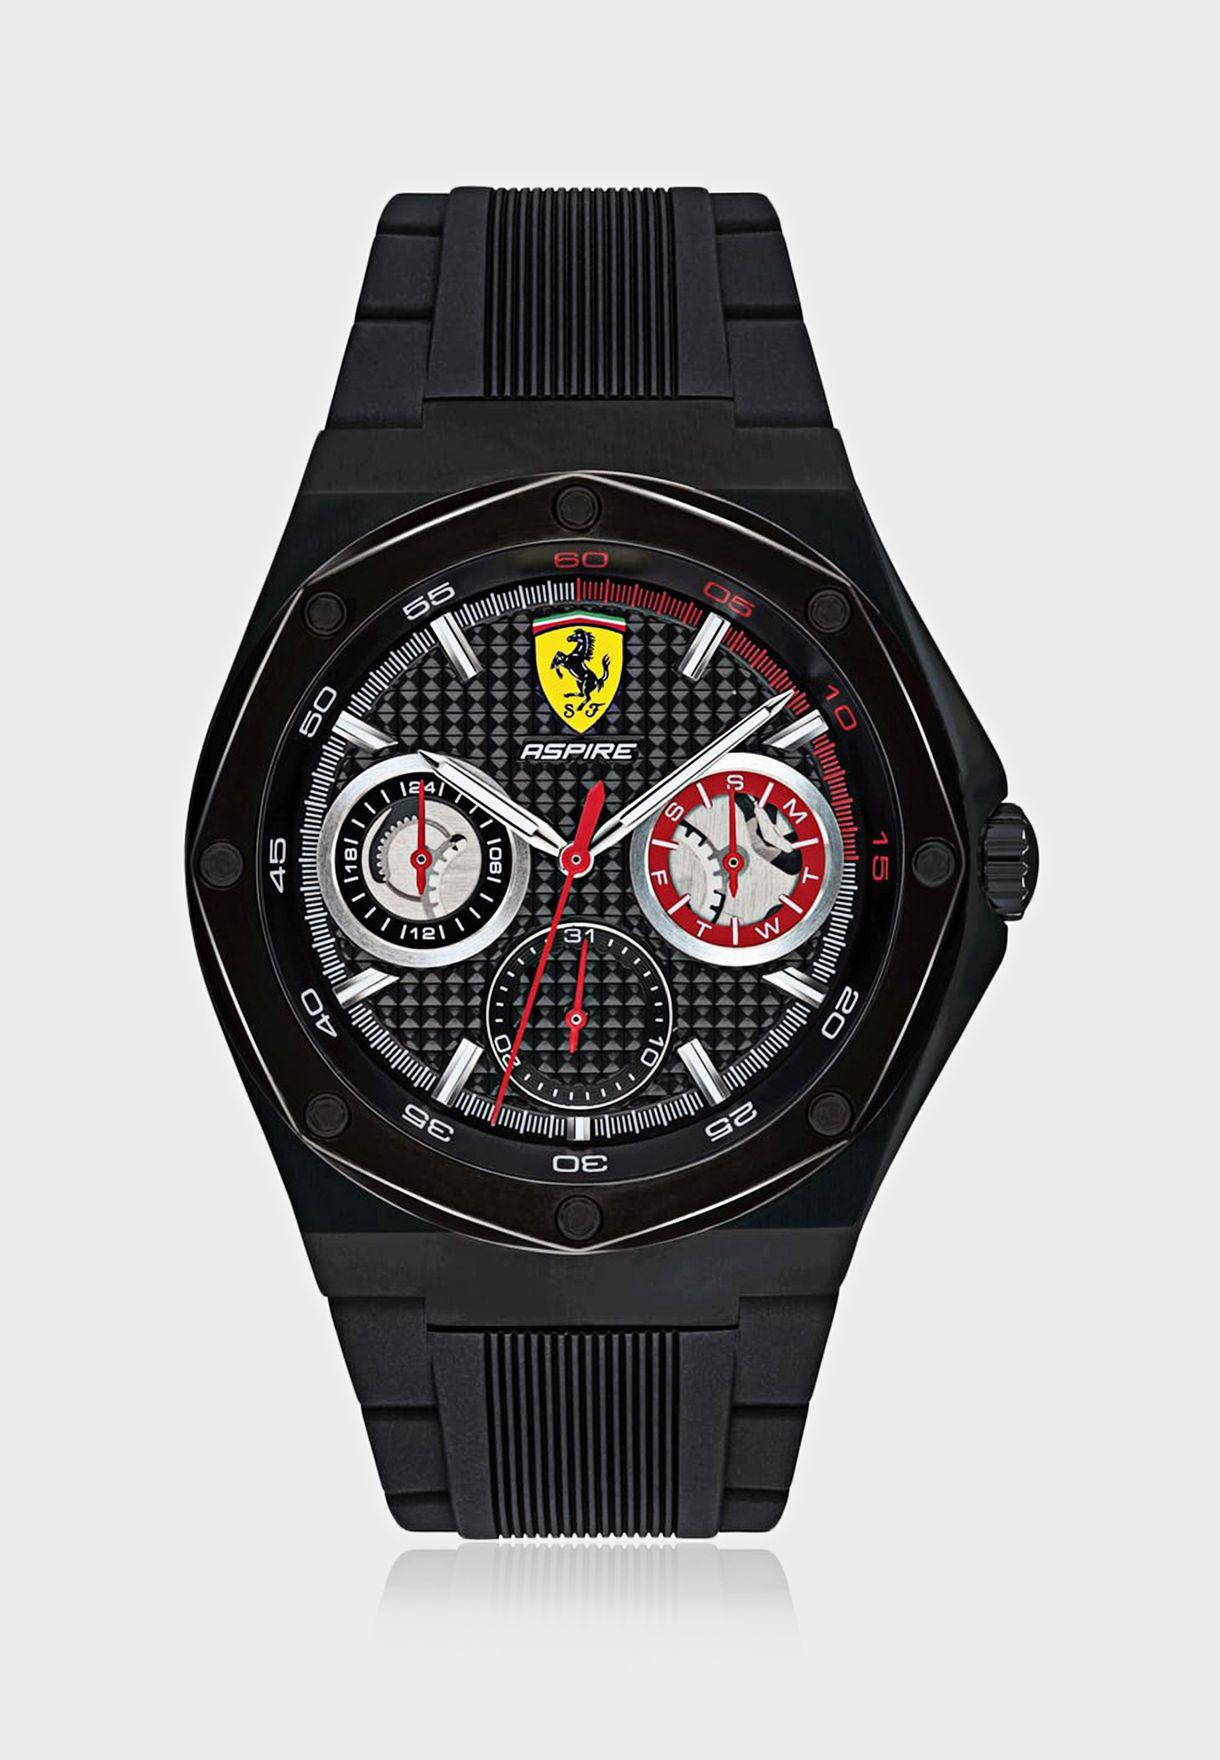 830538 Aspire Analog Watch